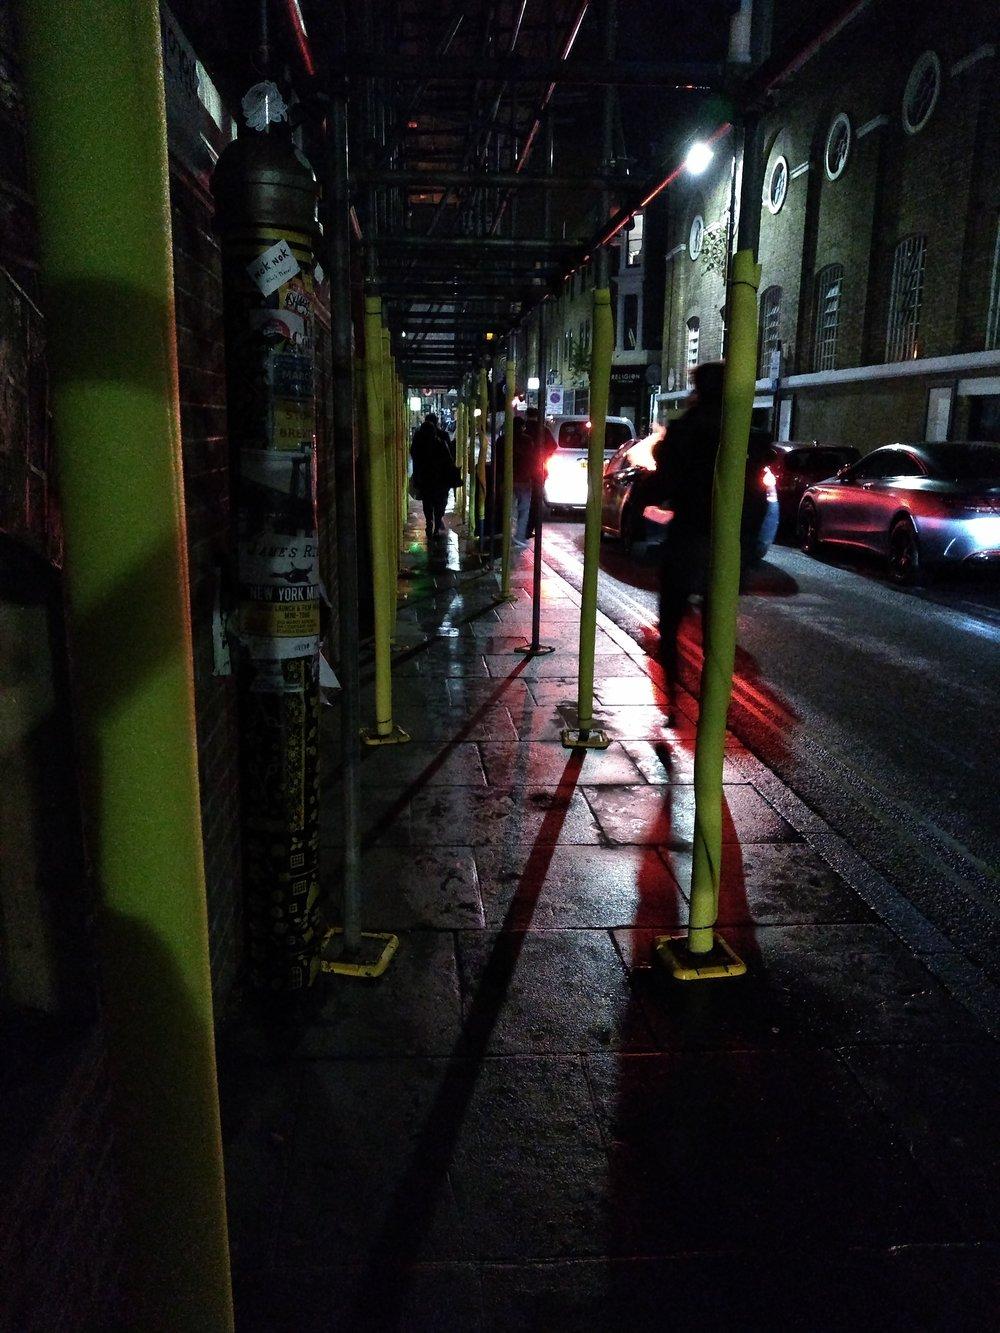 A scene in Brick Lane, by Terry Freedman